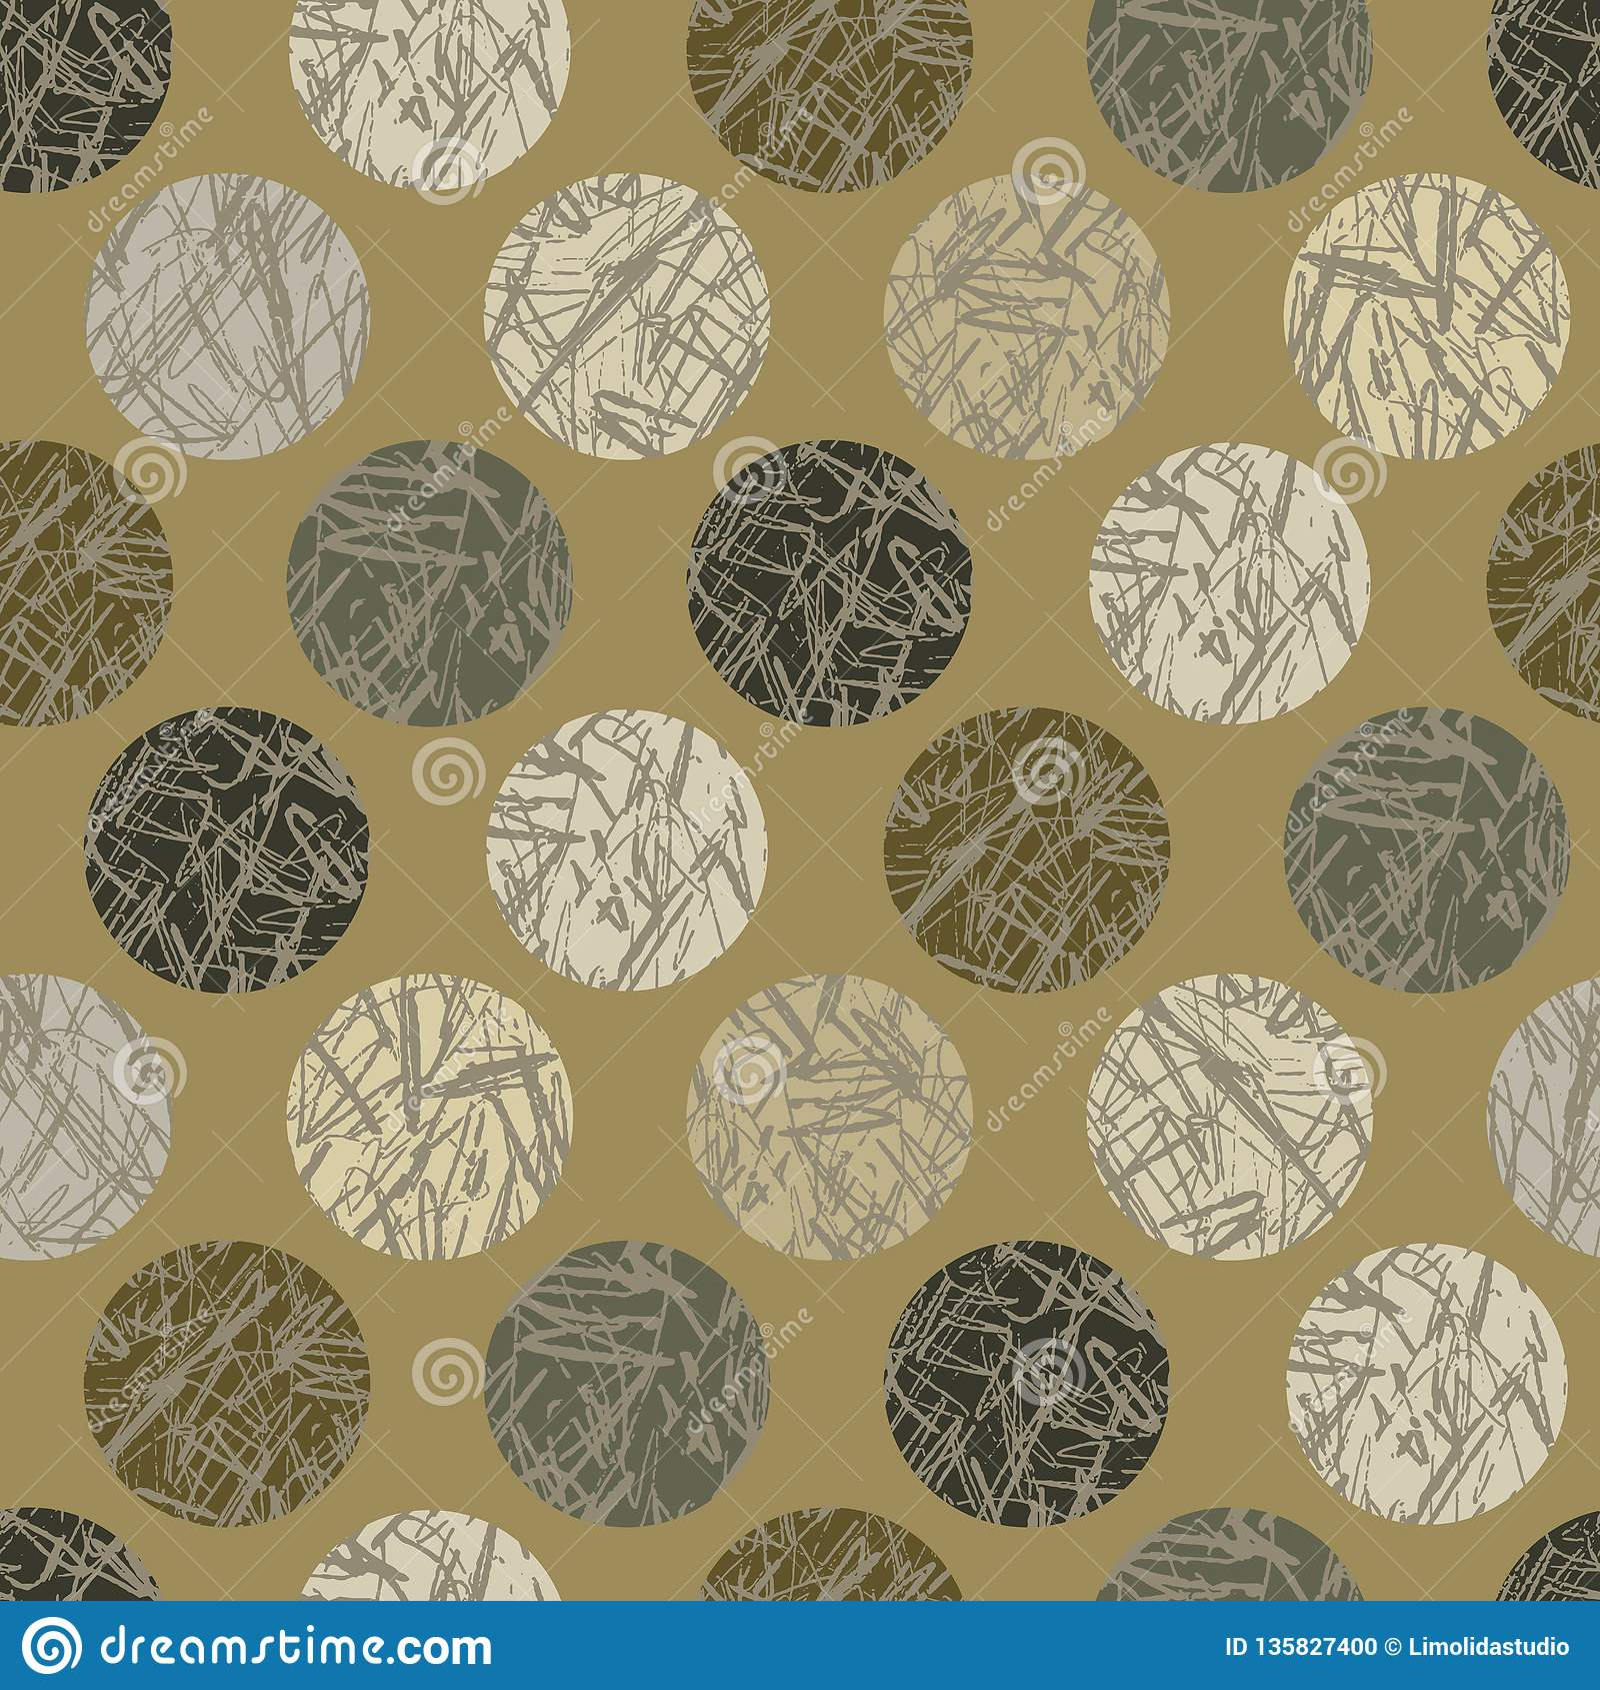 Camo texturpolka Dots Seamless Vector Pattern Background